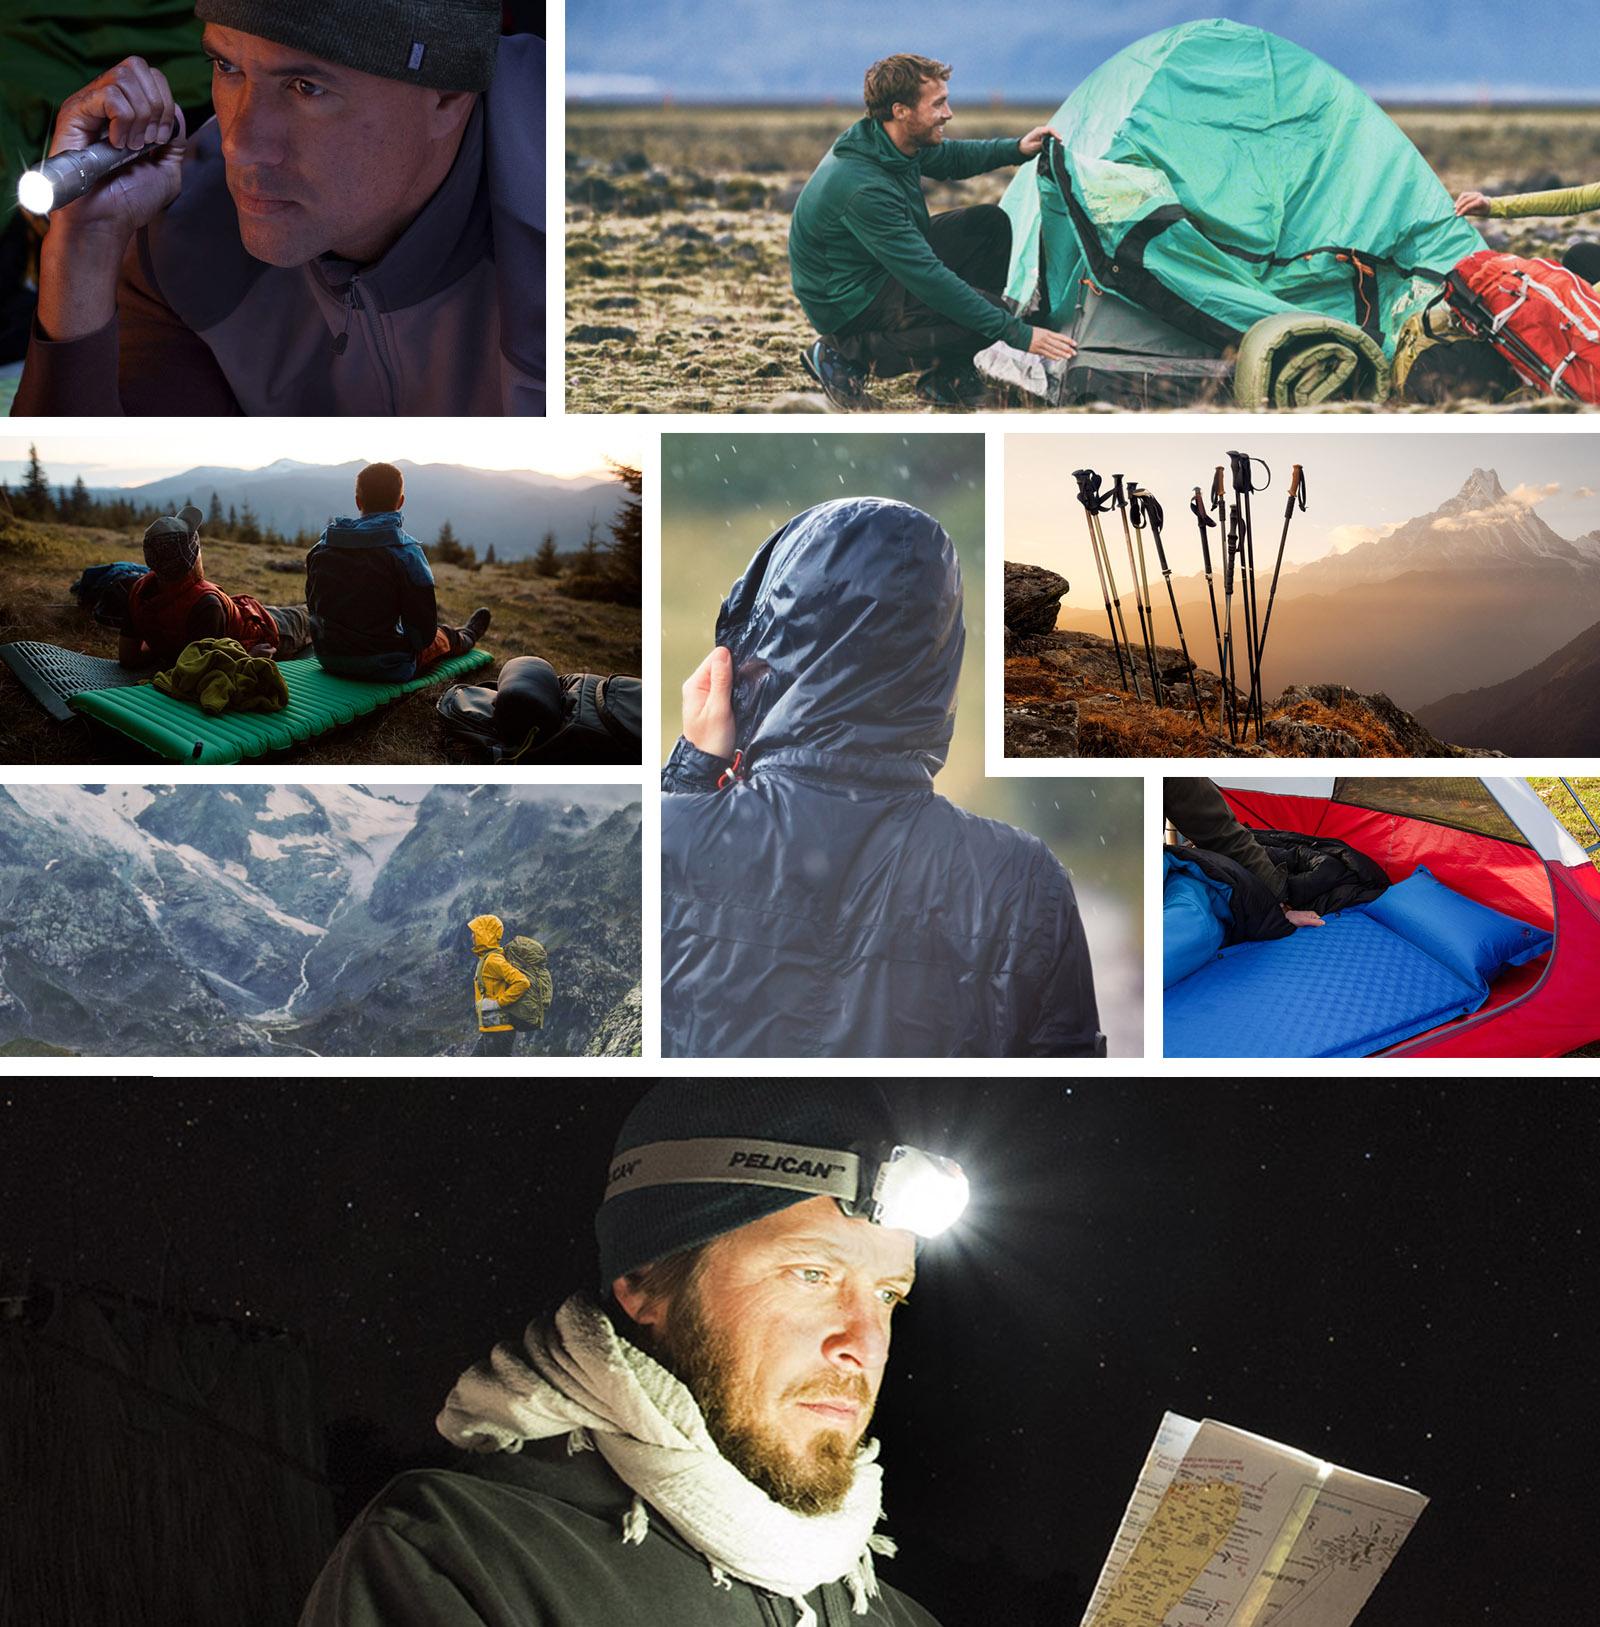 tent flashlight